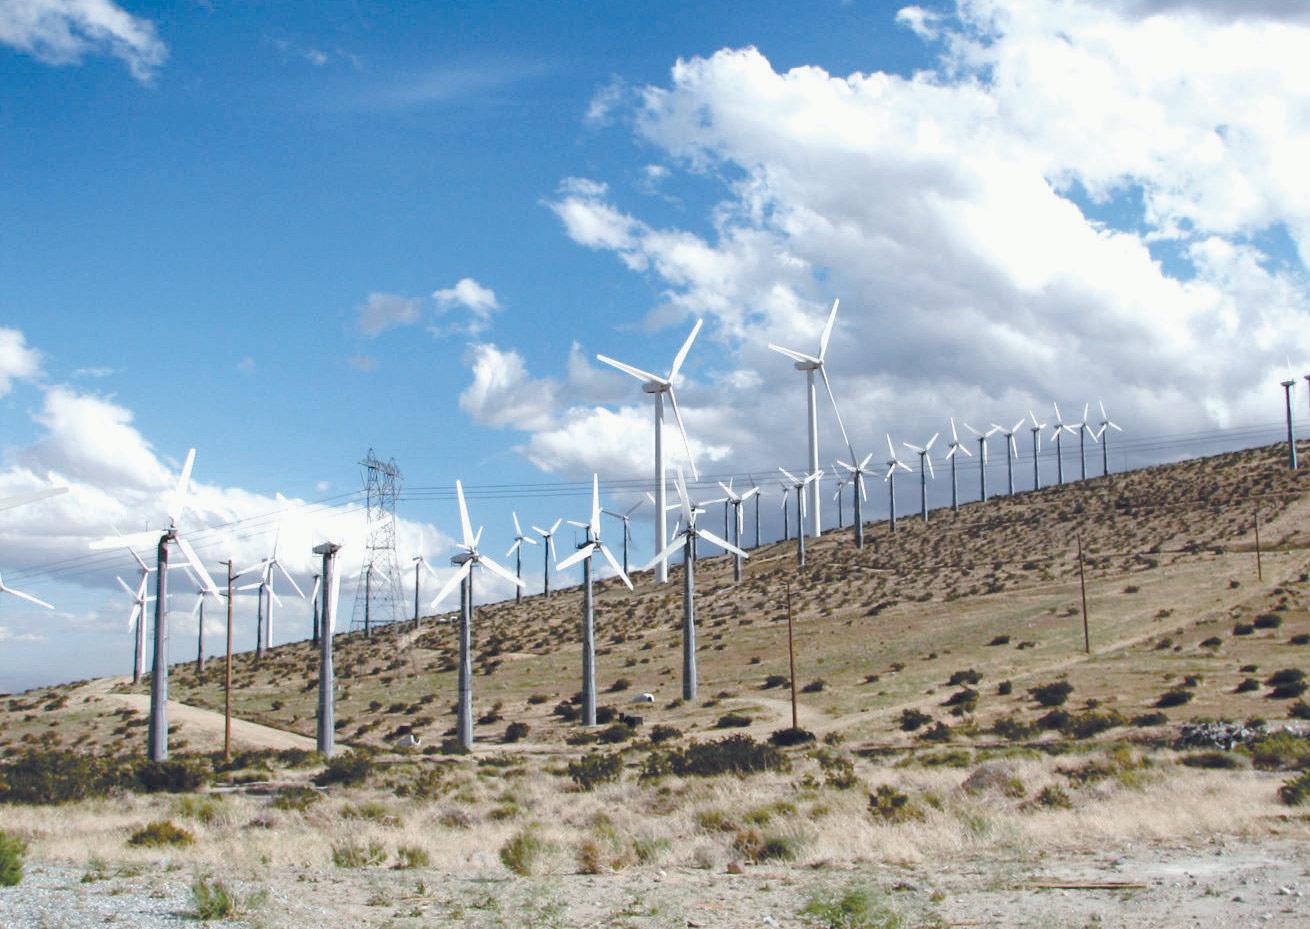 A wind farm near Palm Springs, California.